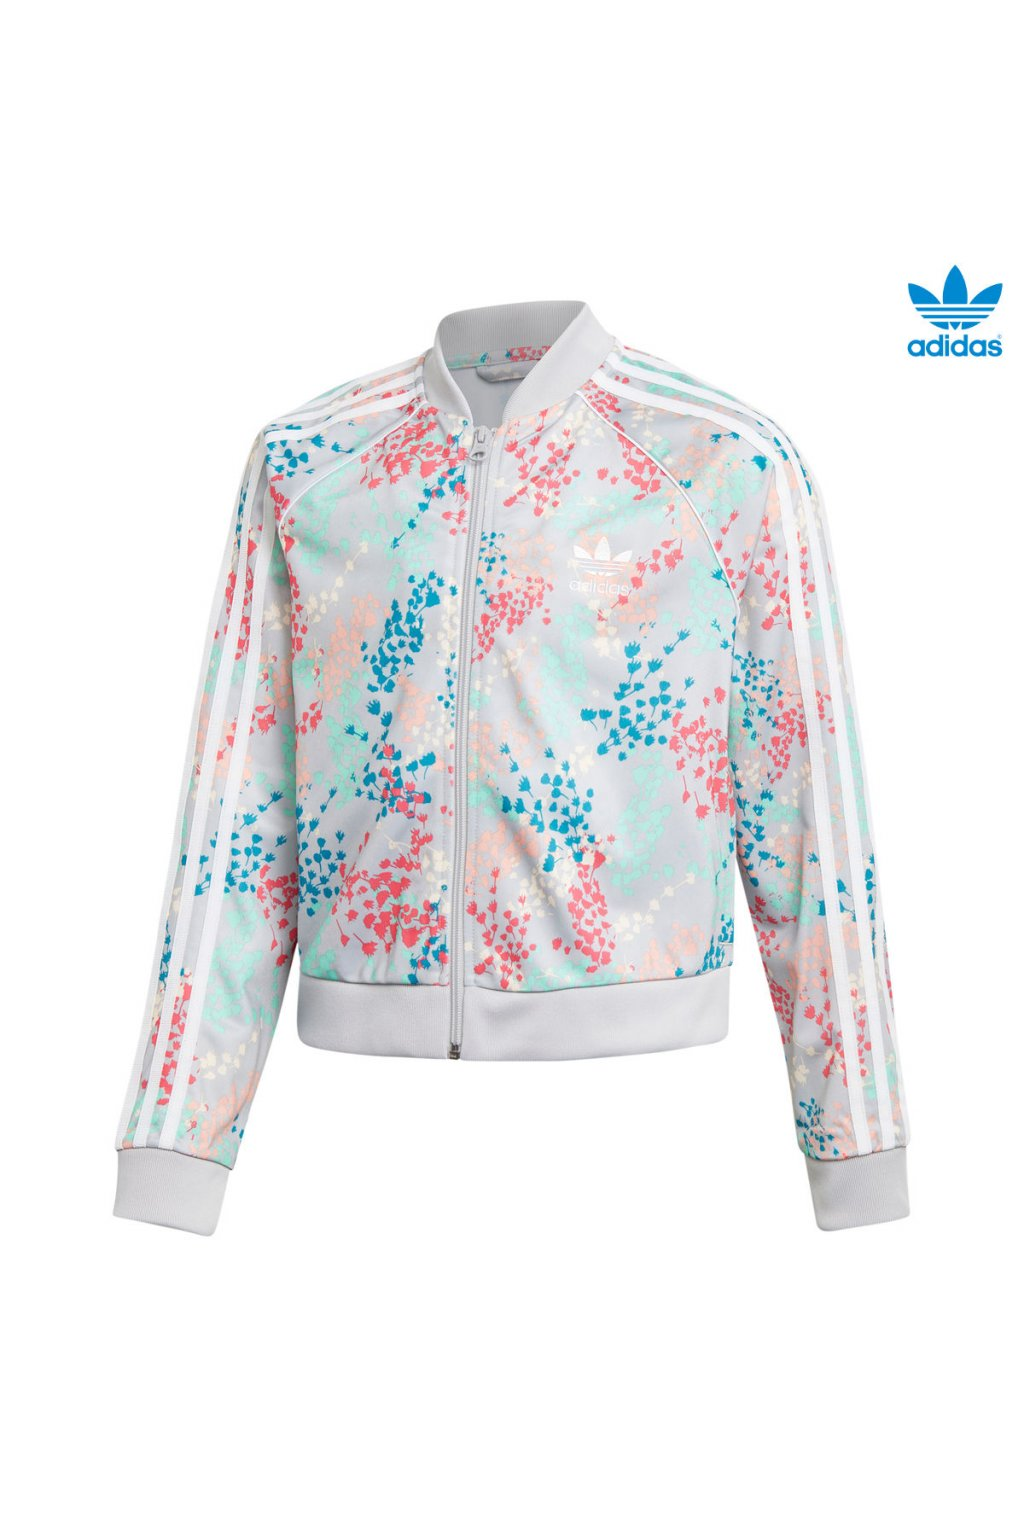 ej6299 damska bunda adidas flowers crp sst top